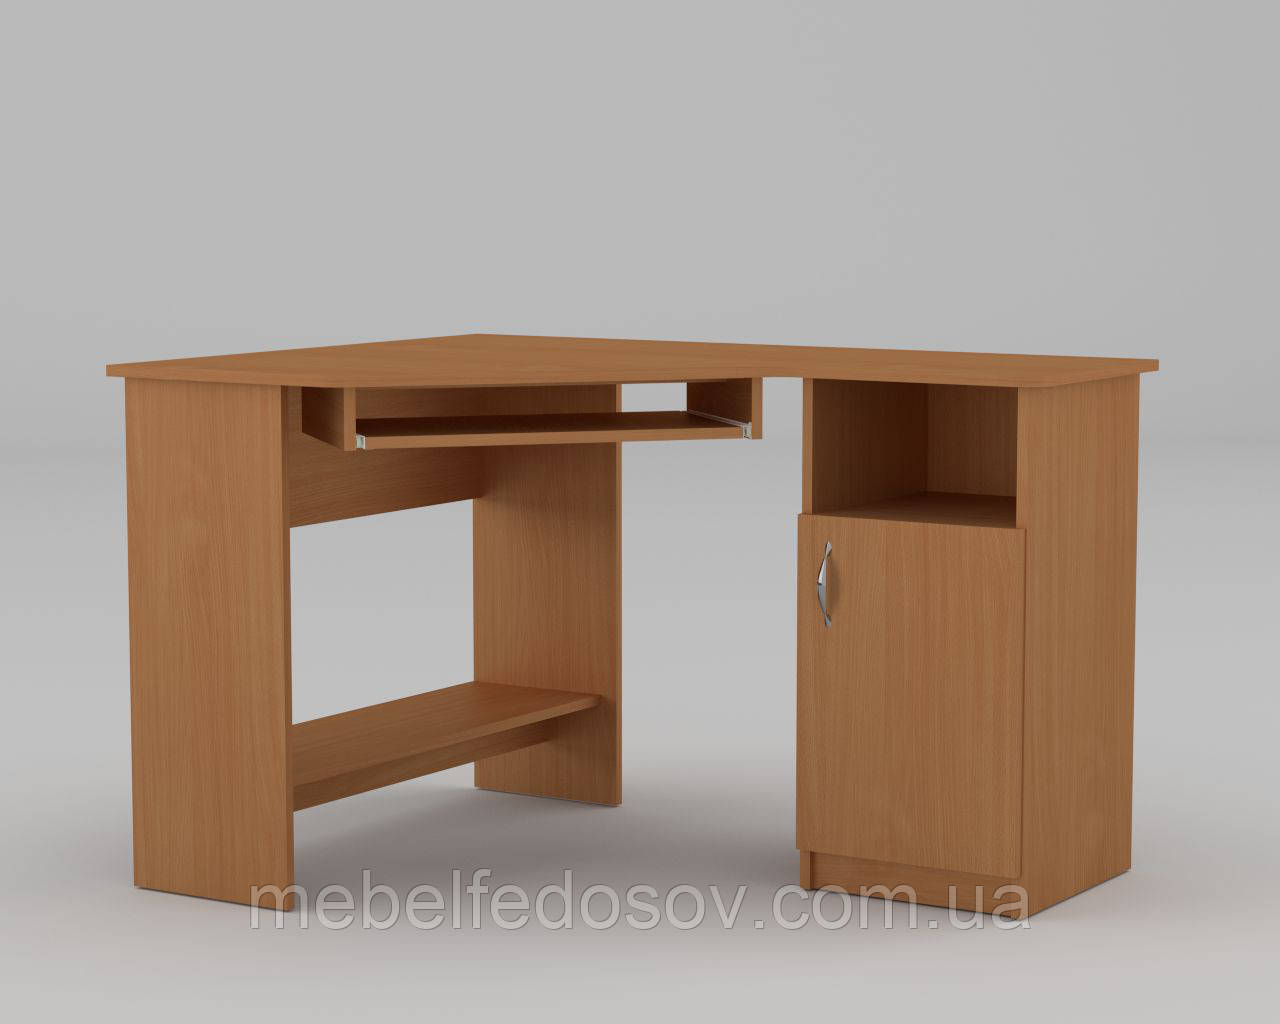 Стол компьютерный СУ-13 (Компанит) 1200х900х749мм